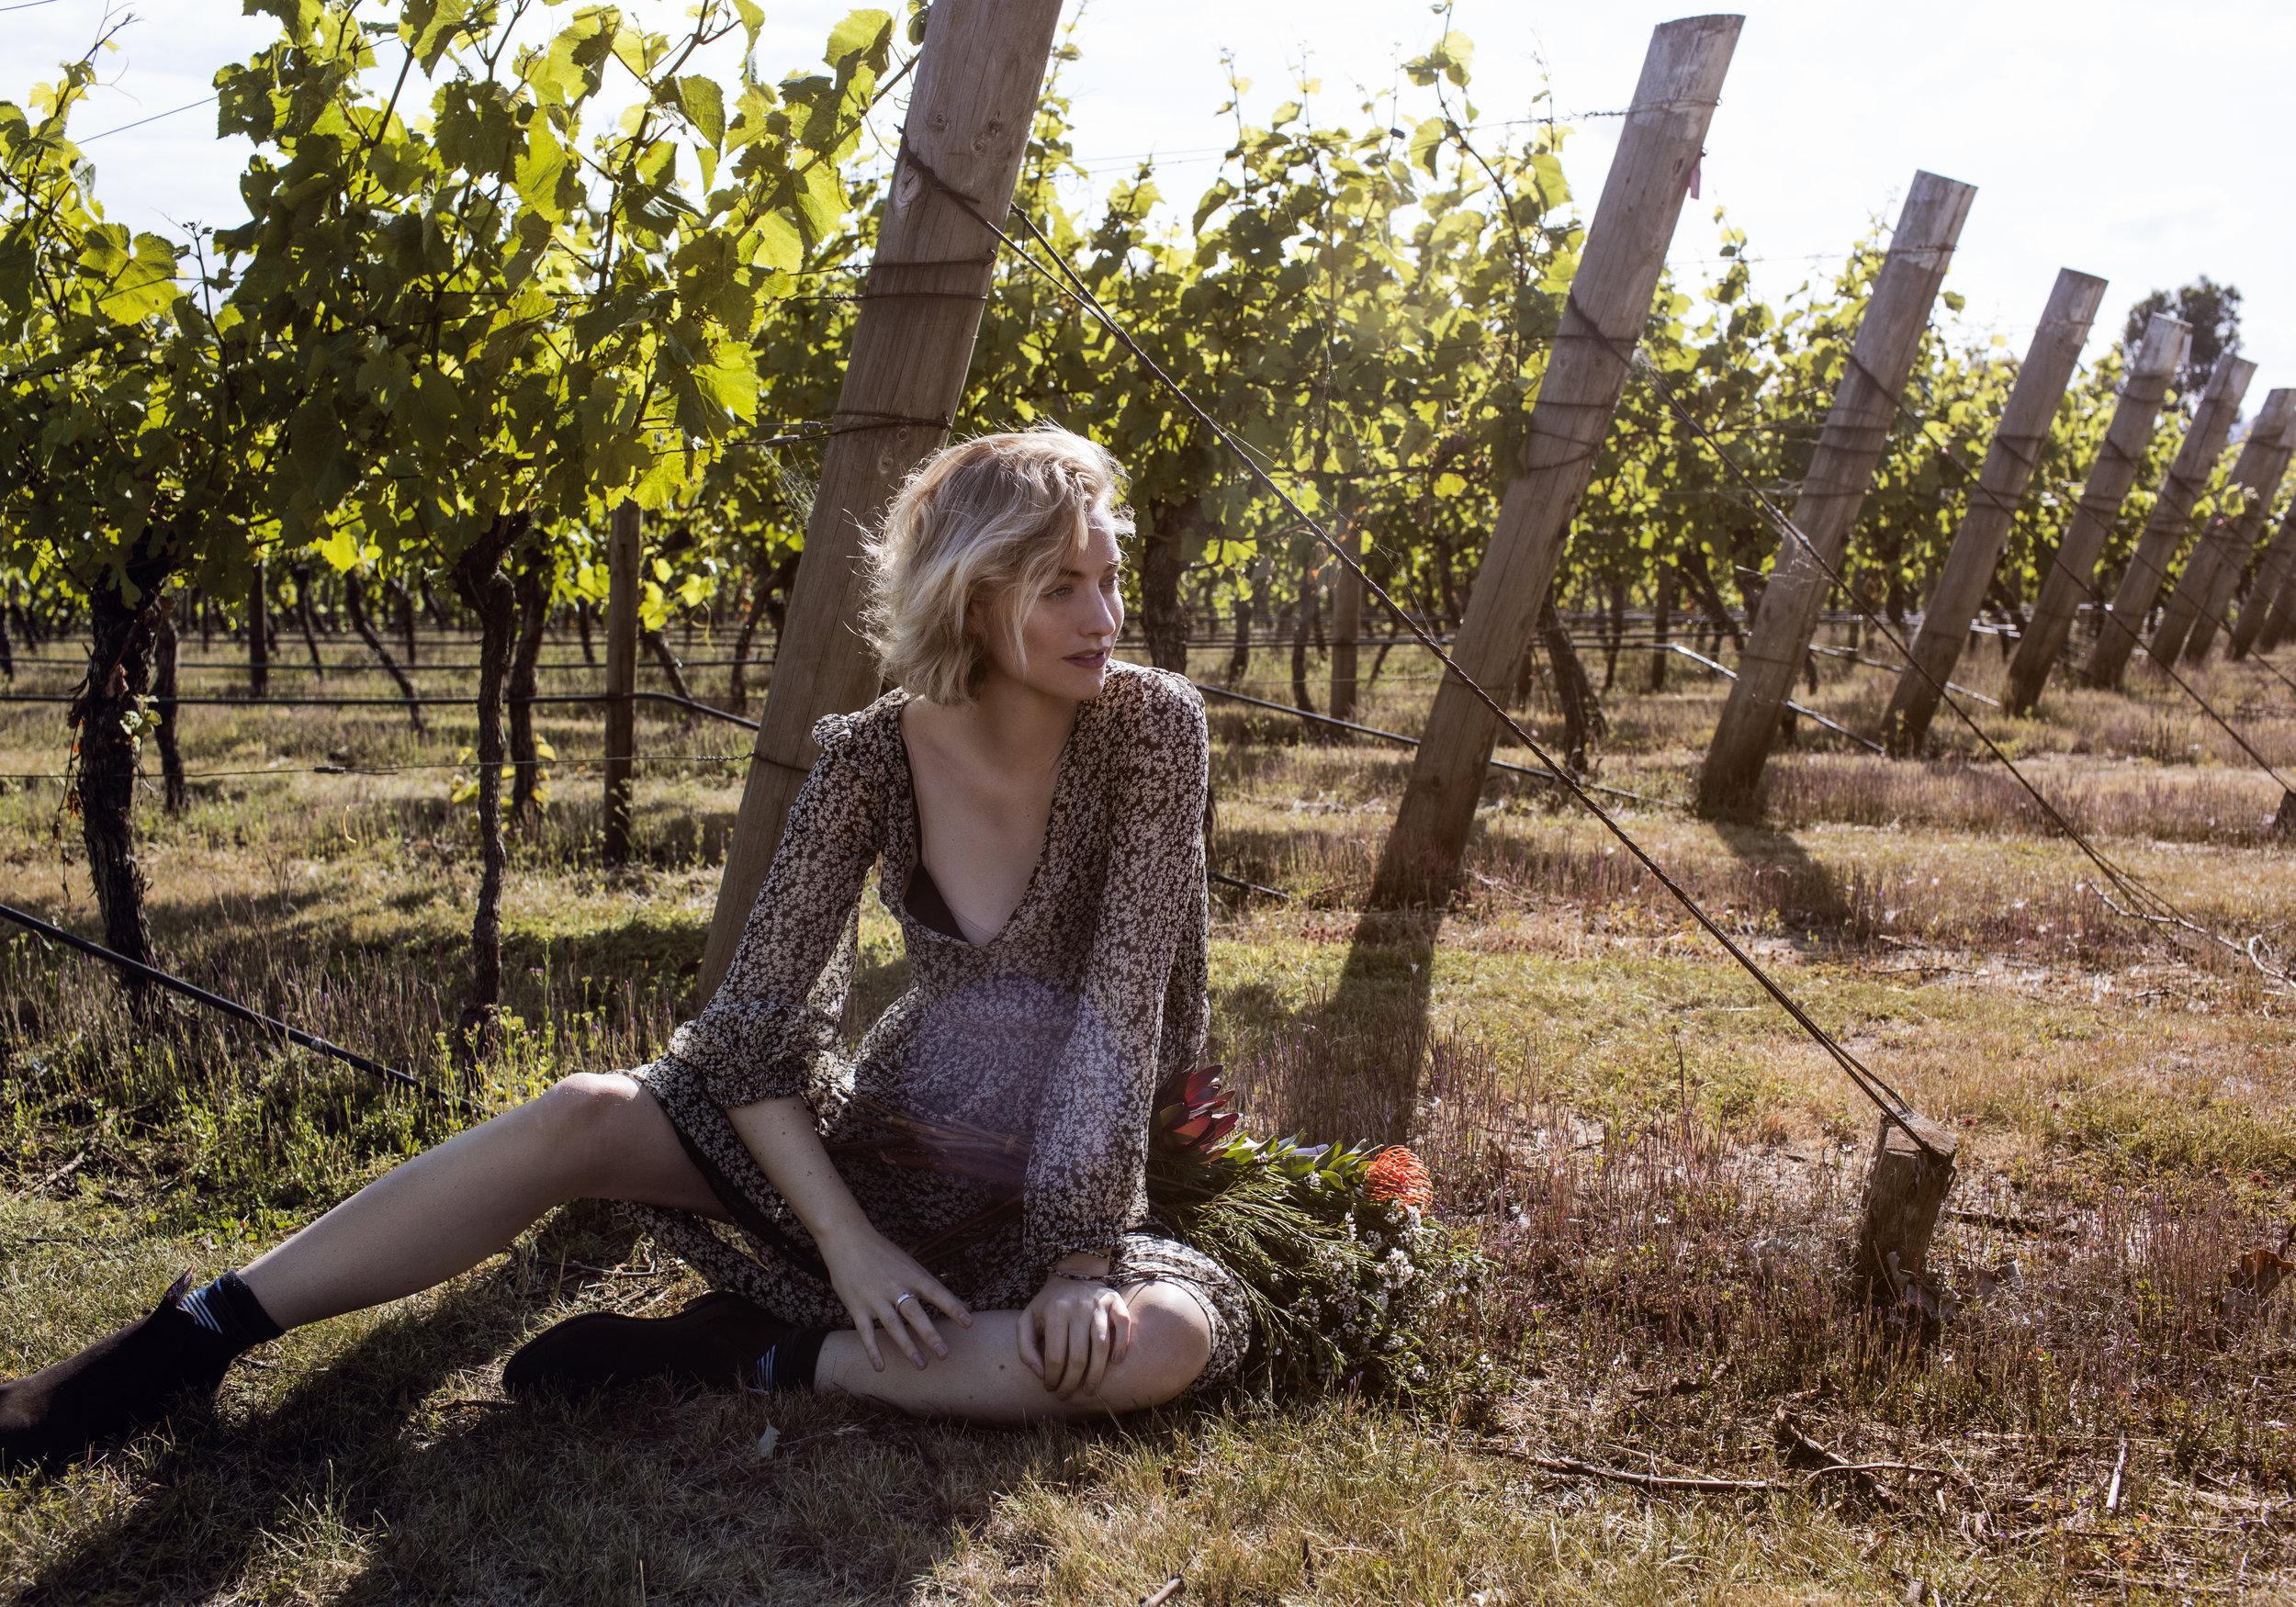 Janzs-zanita-sparkling-tasmania-floral-winery-vinyard.jpg